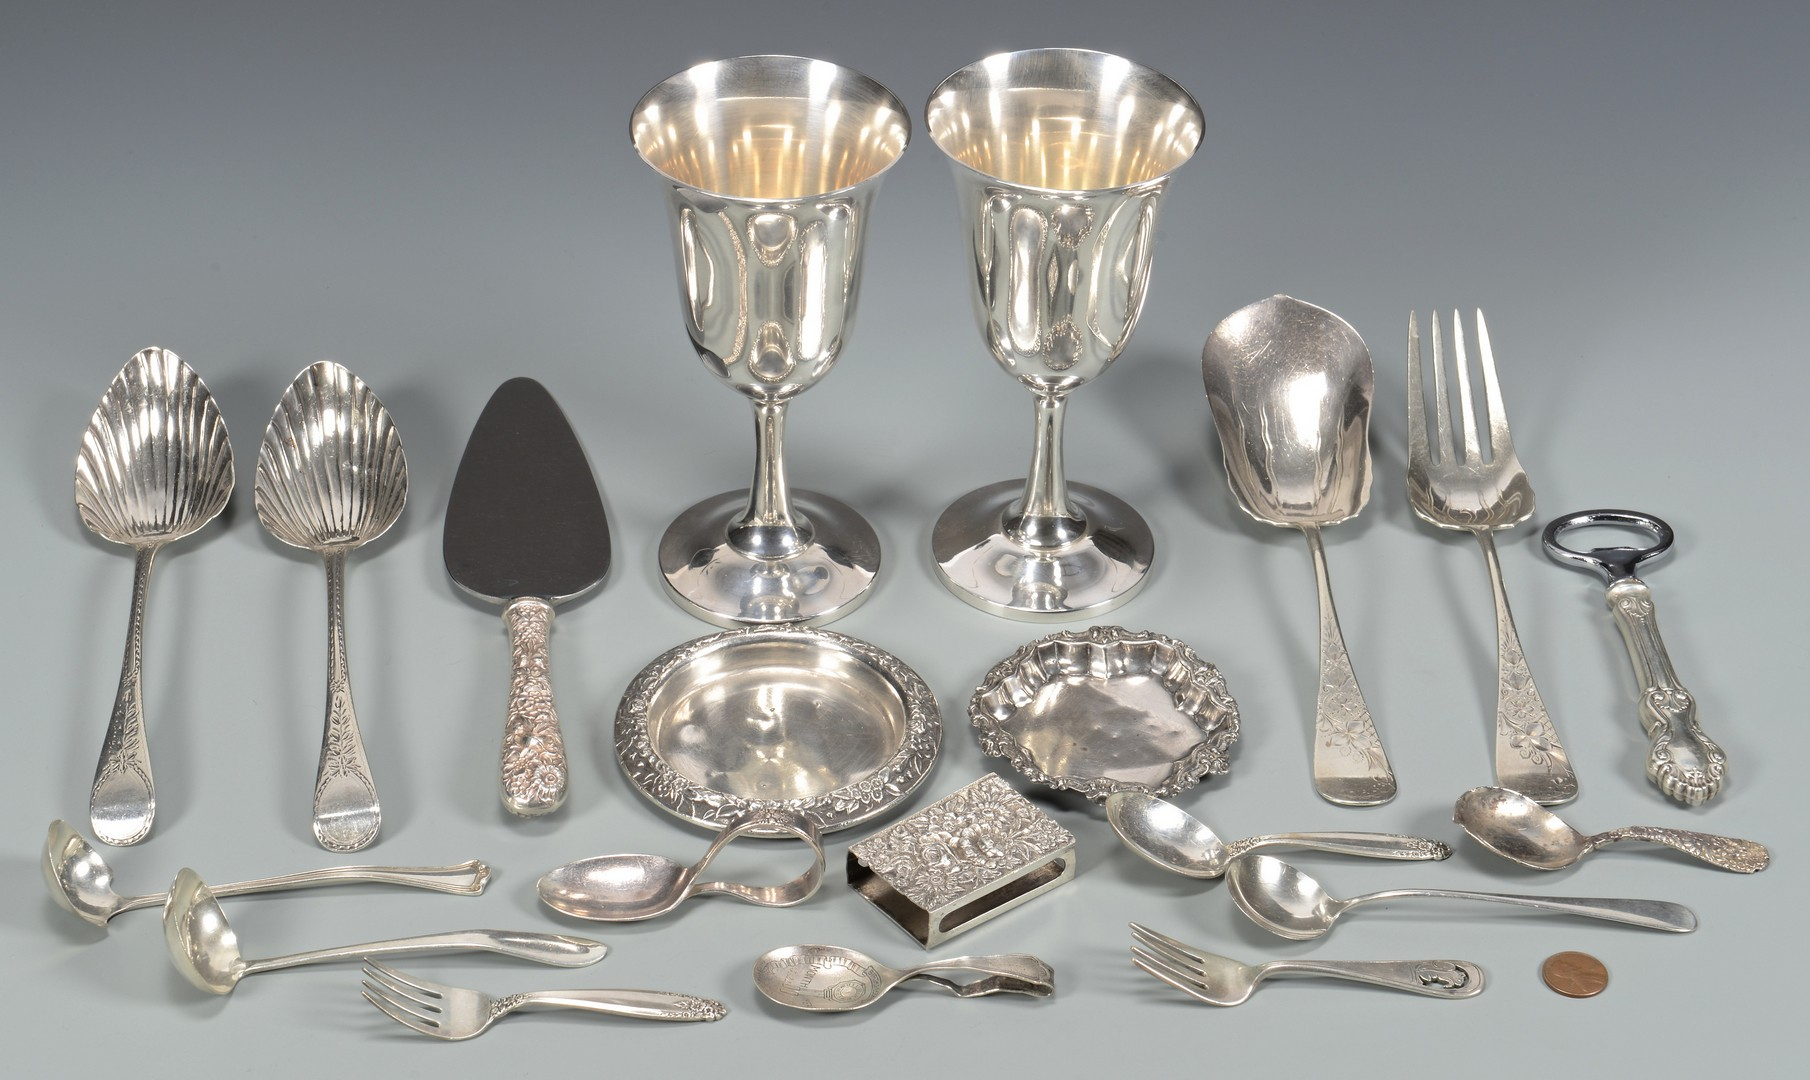 Lot 685: Misc. Sterling flatware plus 2 Goblets